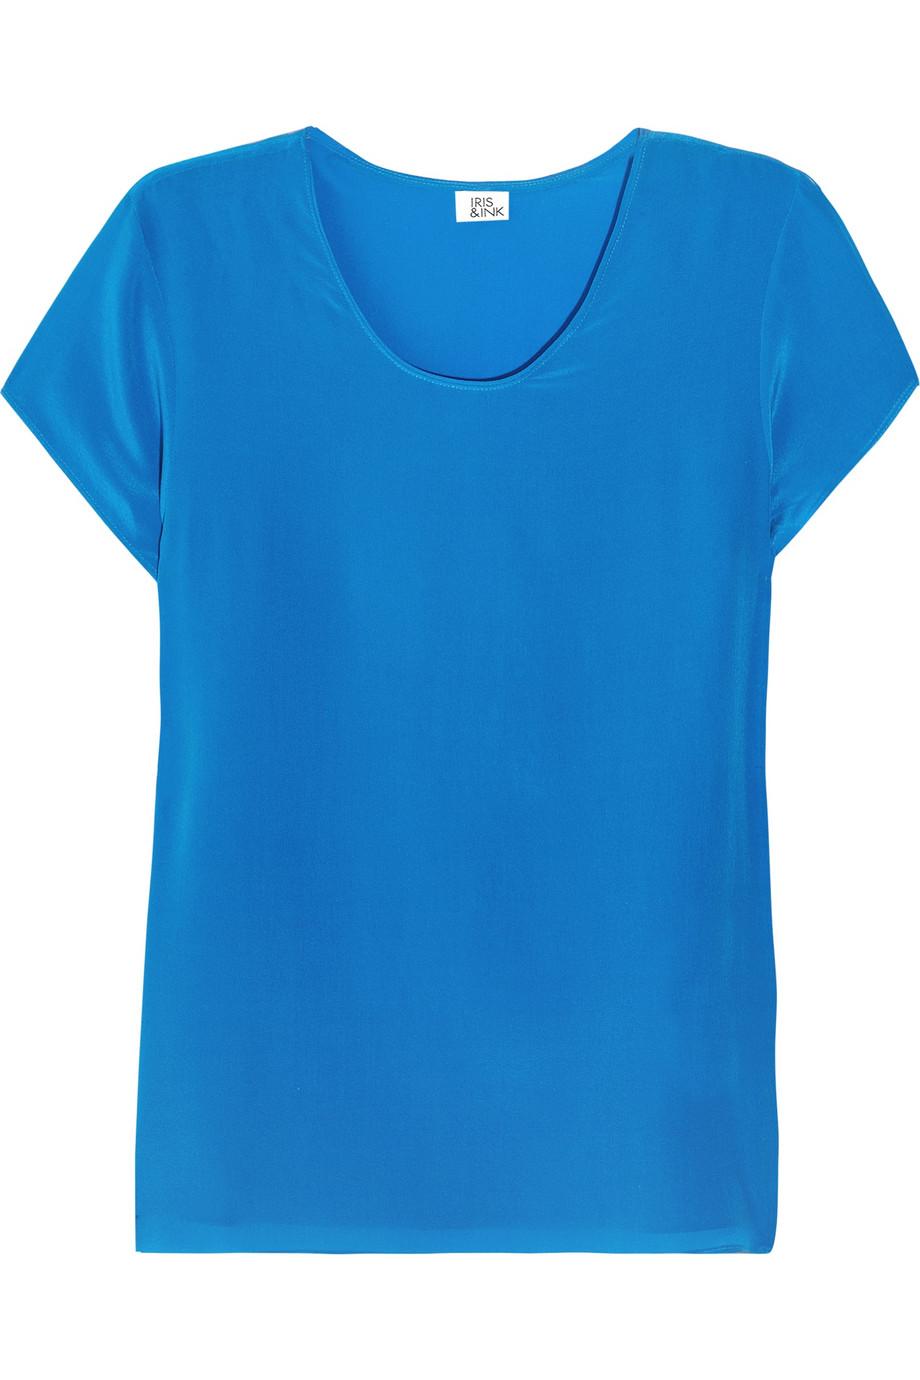 T-Shirt Printing, Custom T-Shirts OnlineFast Turnaround· Free Custom Art.